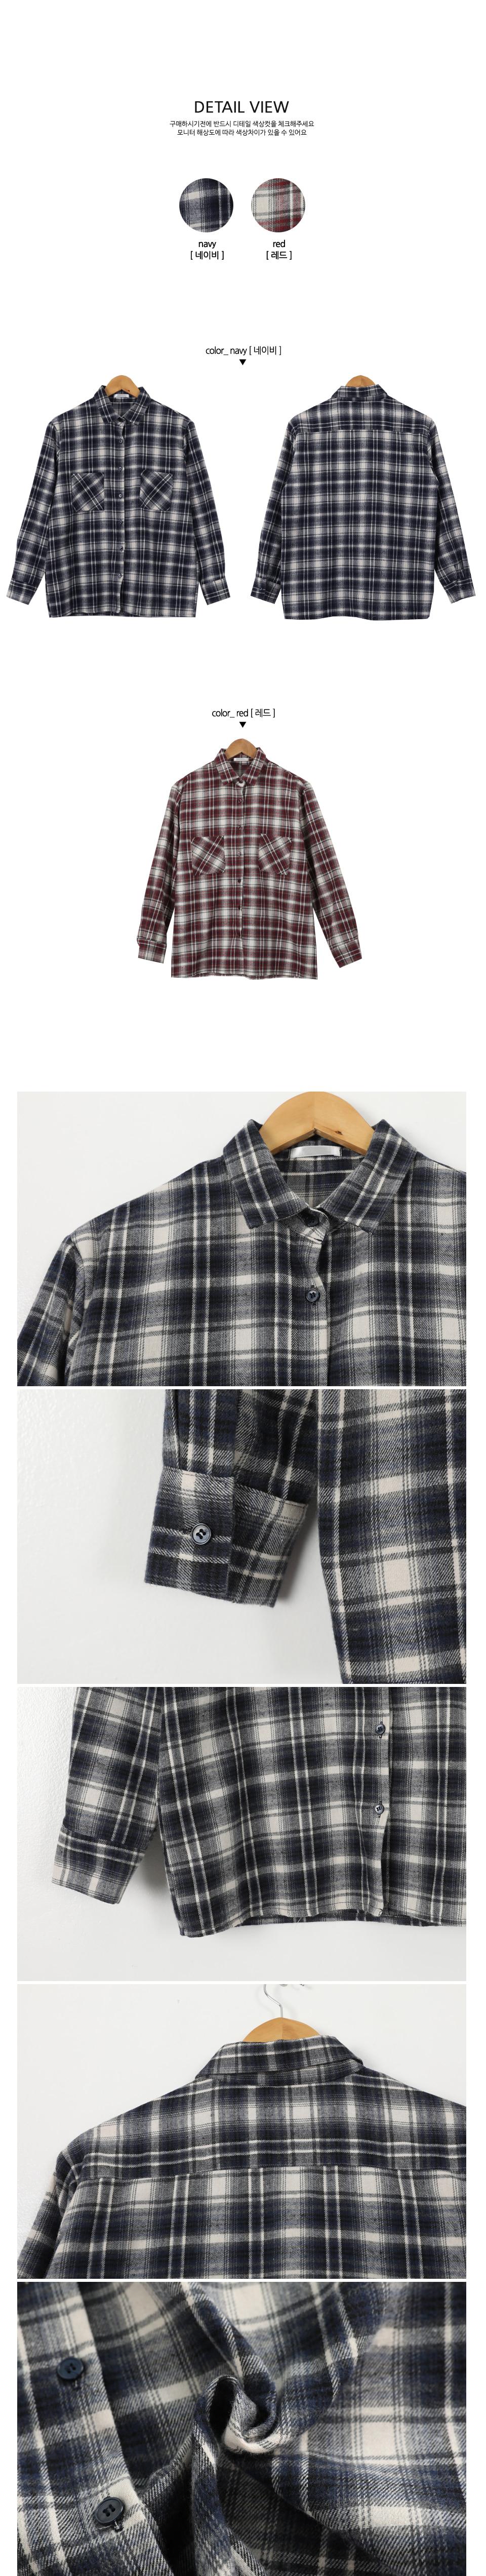 Formal check brushed shirt